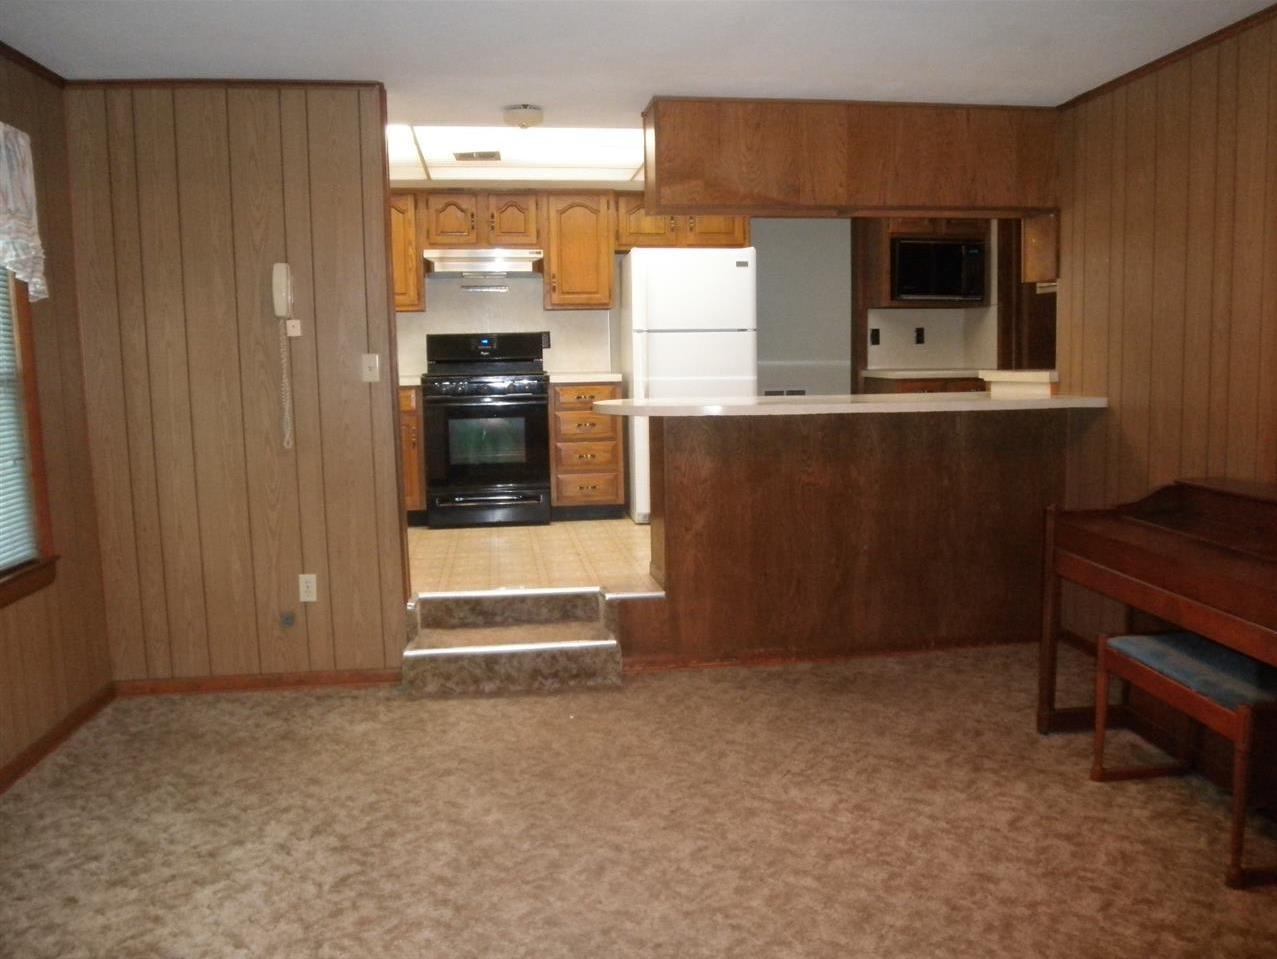 Sold Cross Sale W/ MLS | 916 E Cherry Ponca City, OK 74601 8